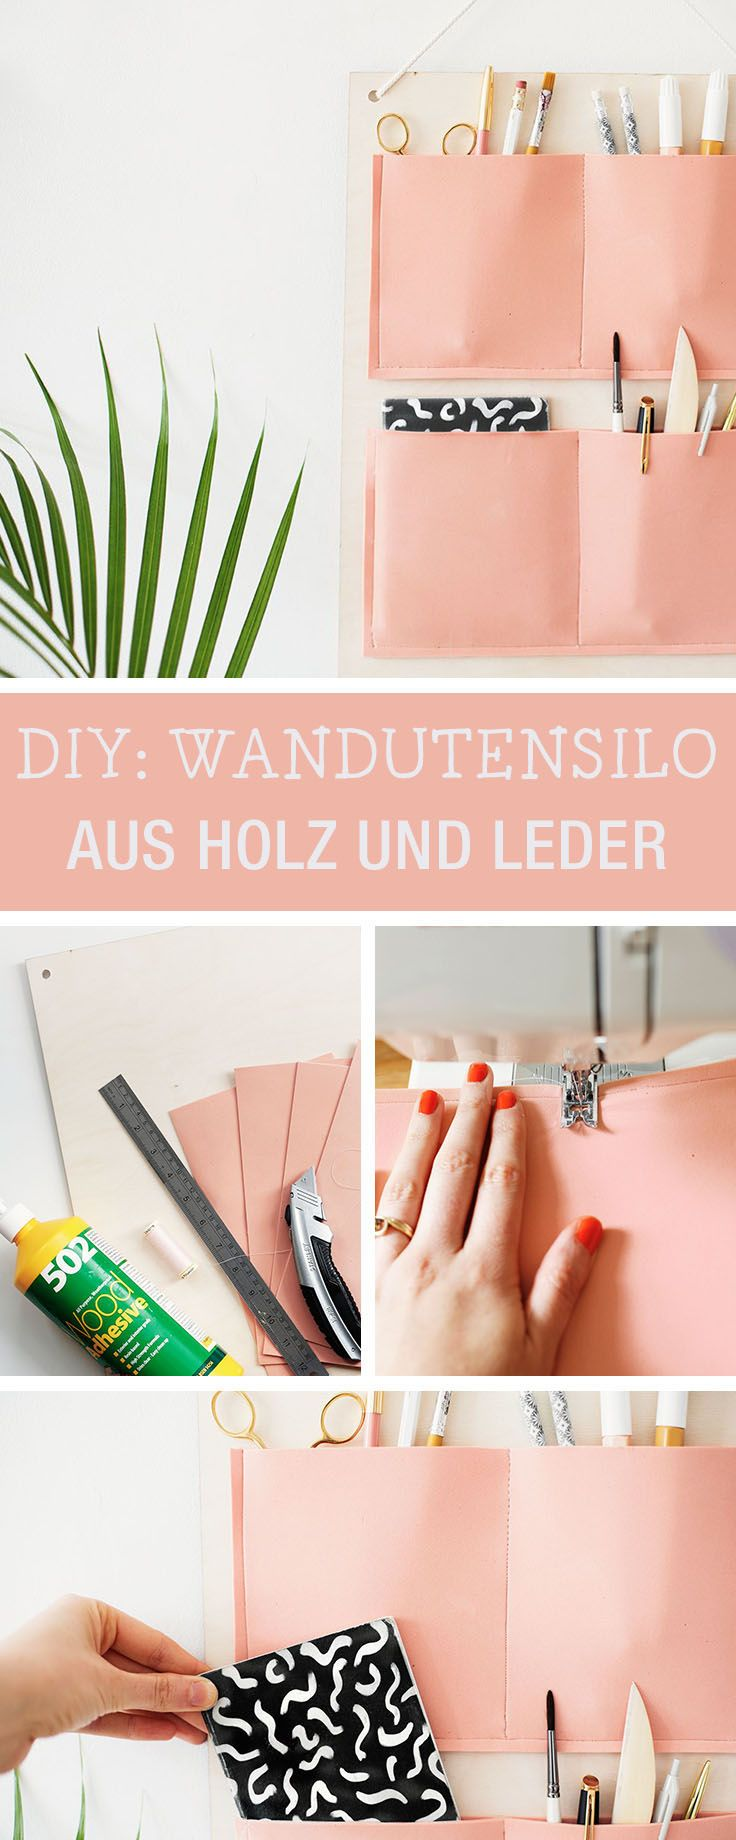 DIY-Inspiration für ein angesagtes Wandutensilo / diy wall utensilo, storage idea for your home via DaWanda.com